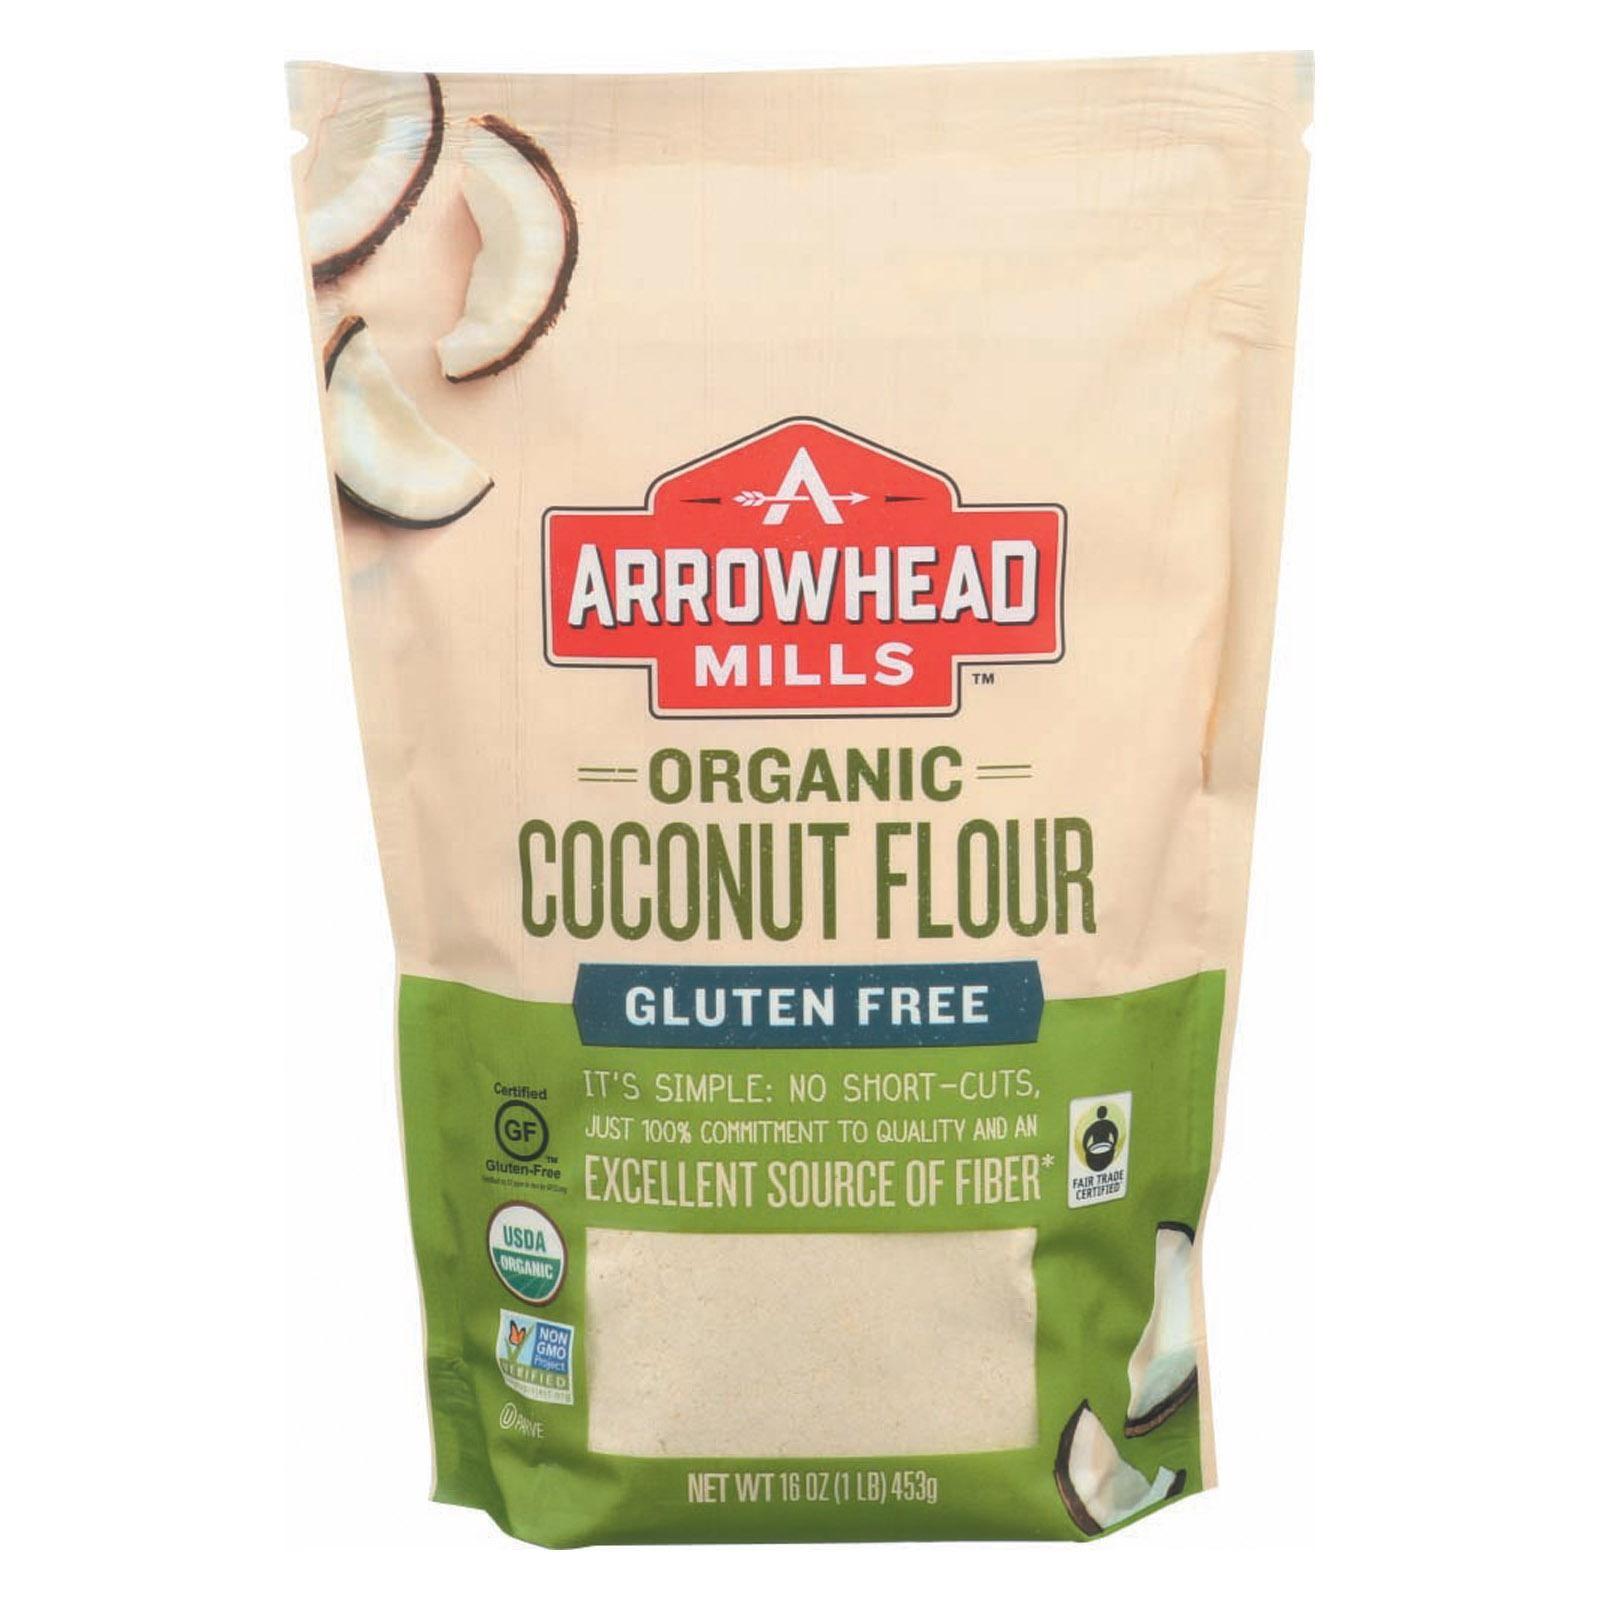 Arrowhead Mills Organic Coconut Flour - pack of 6 - 16 Oz.